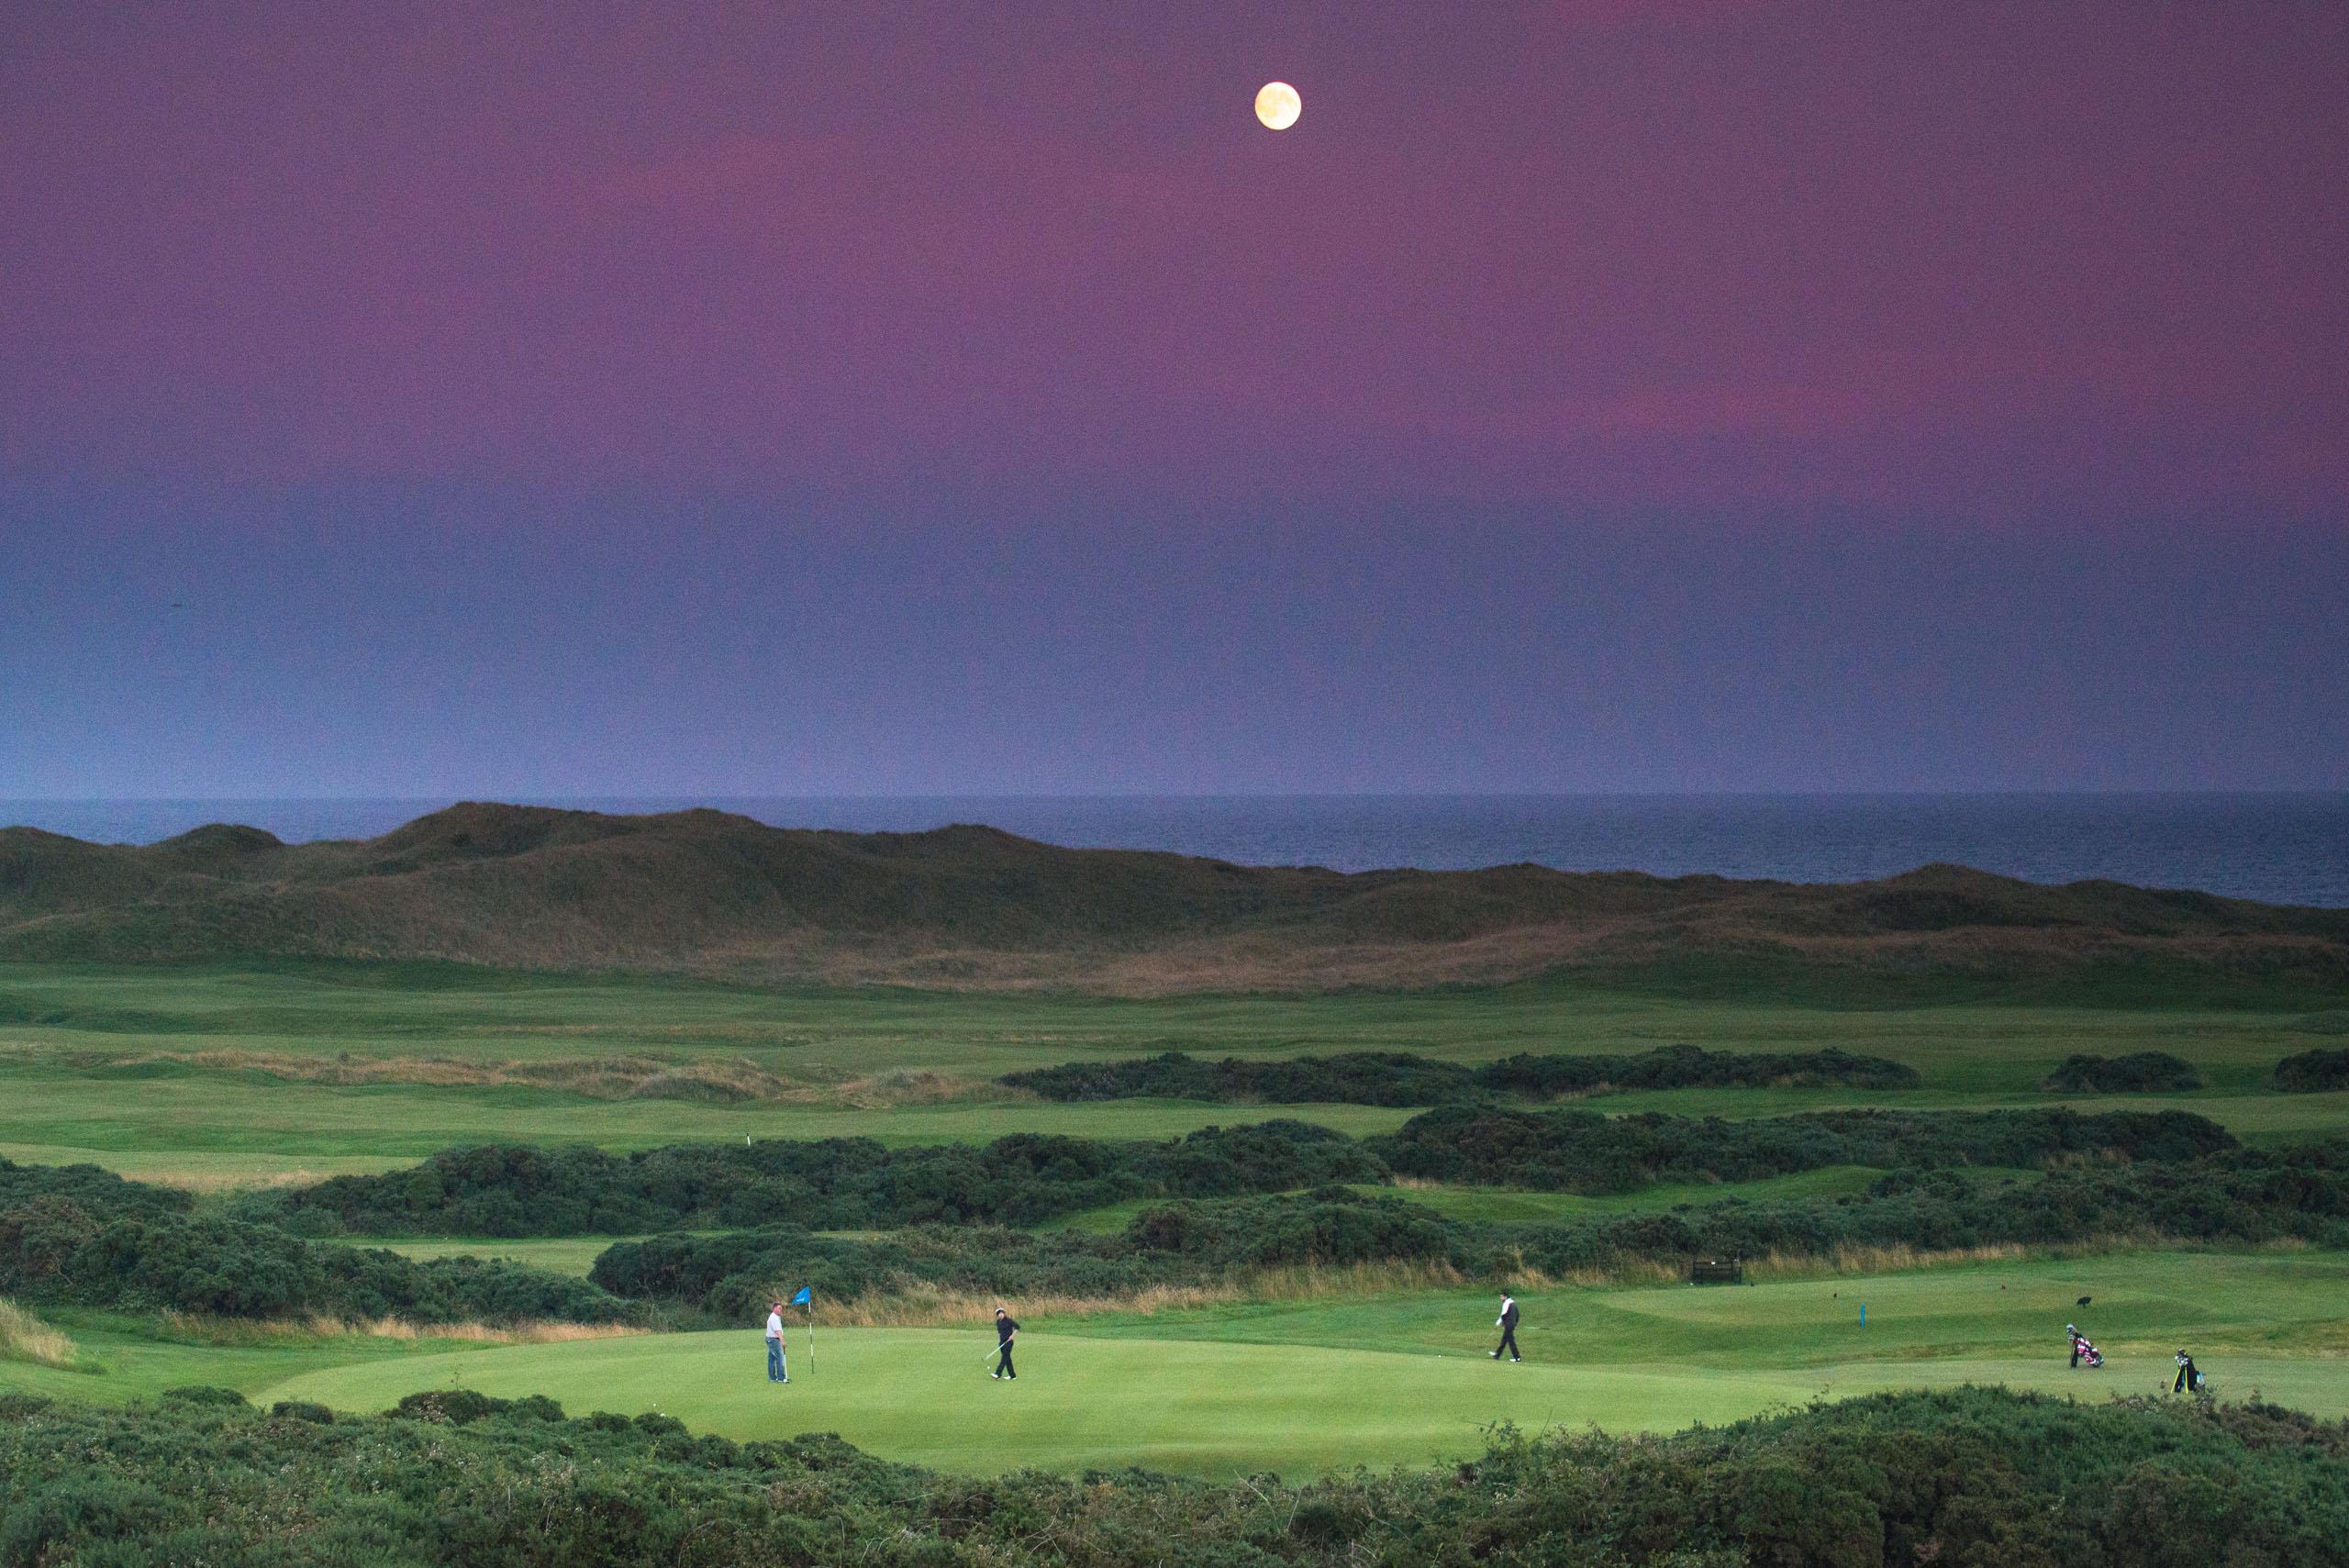 Cruden Bay Moon. Photo by Kevin Markham